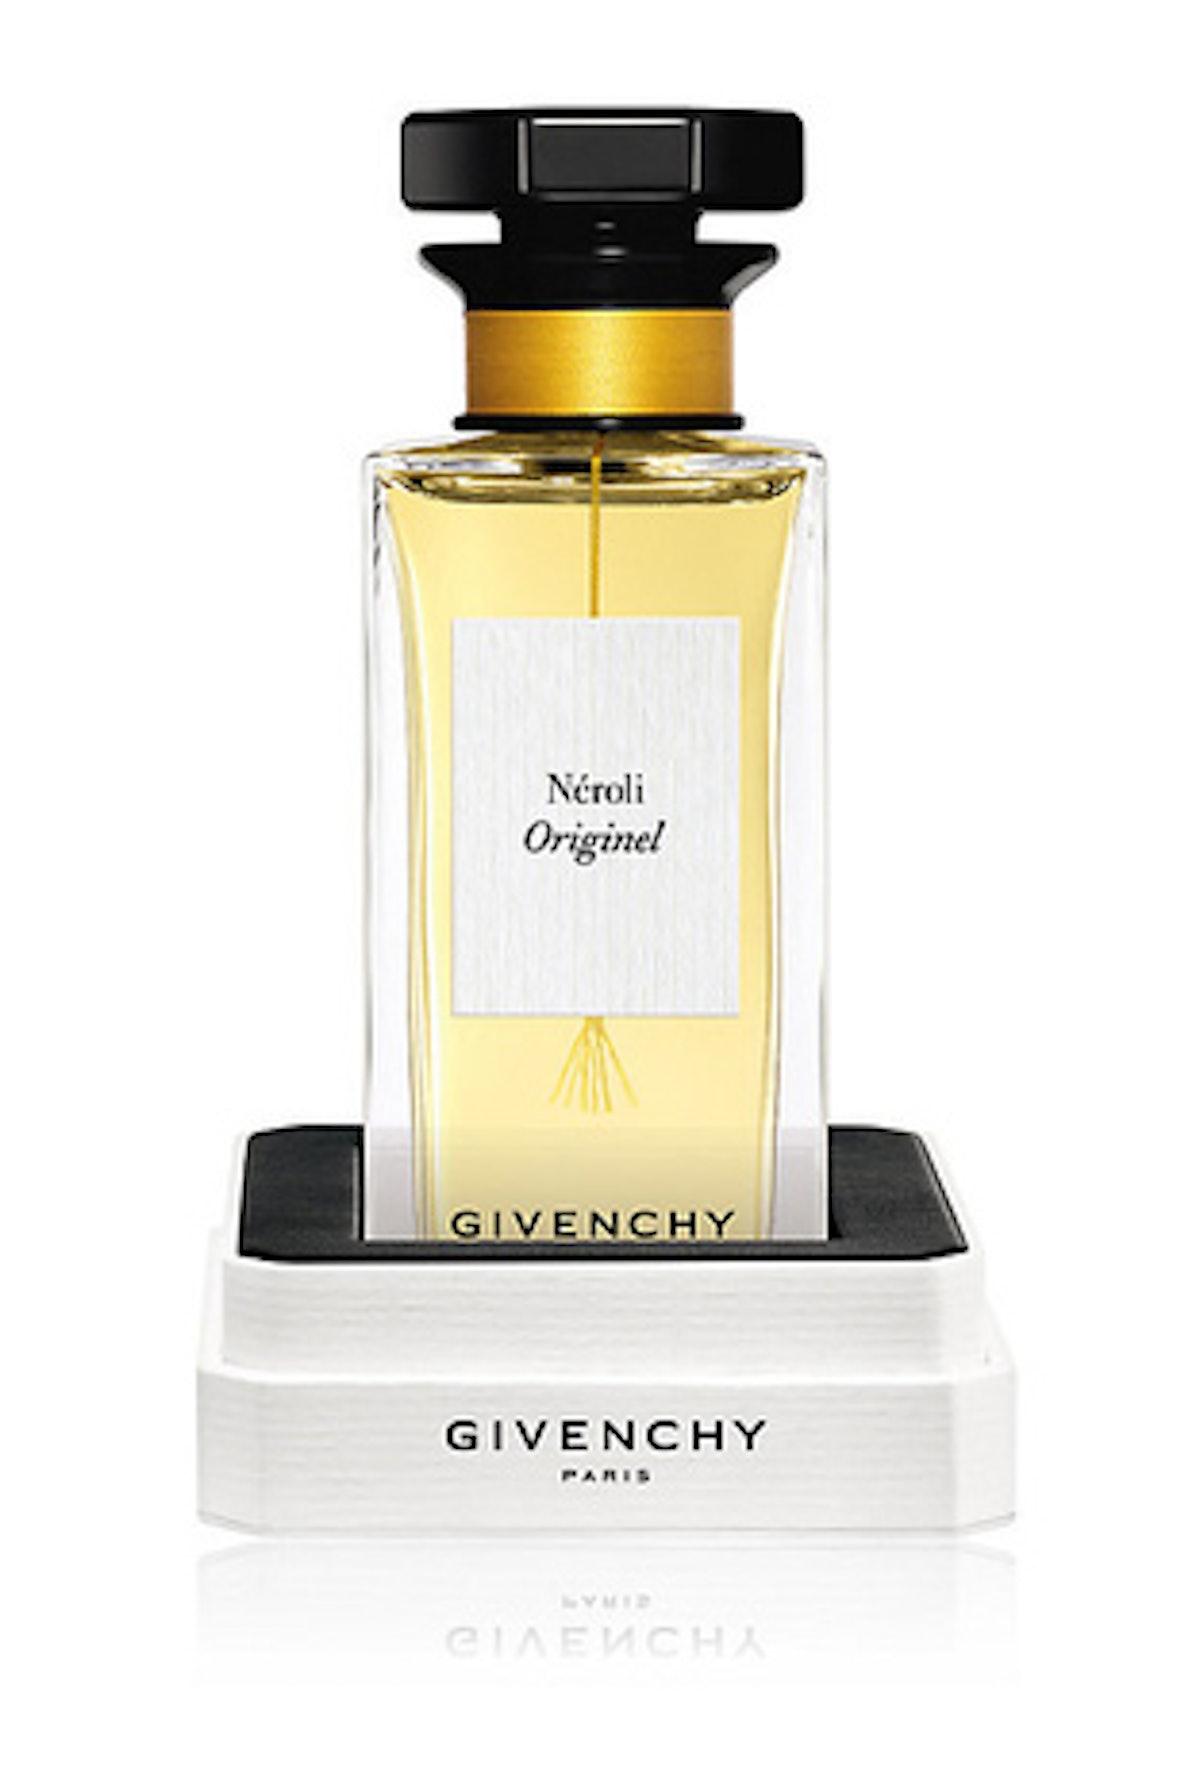 Givenchy L'Atelier Néroli Originel